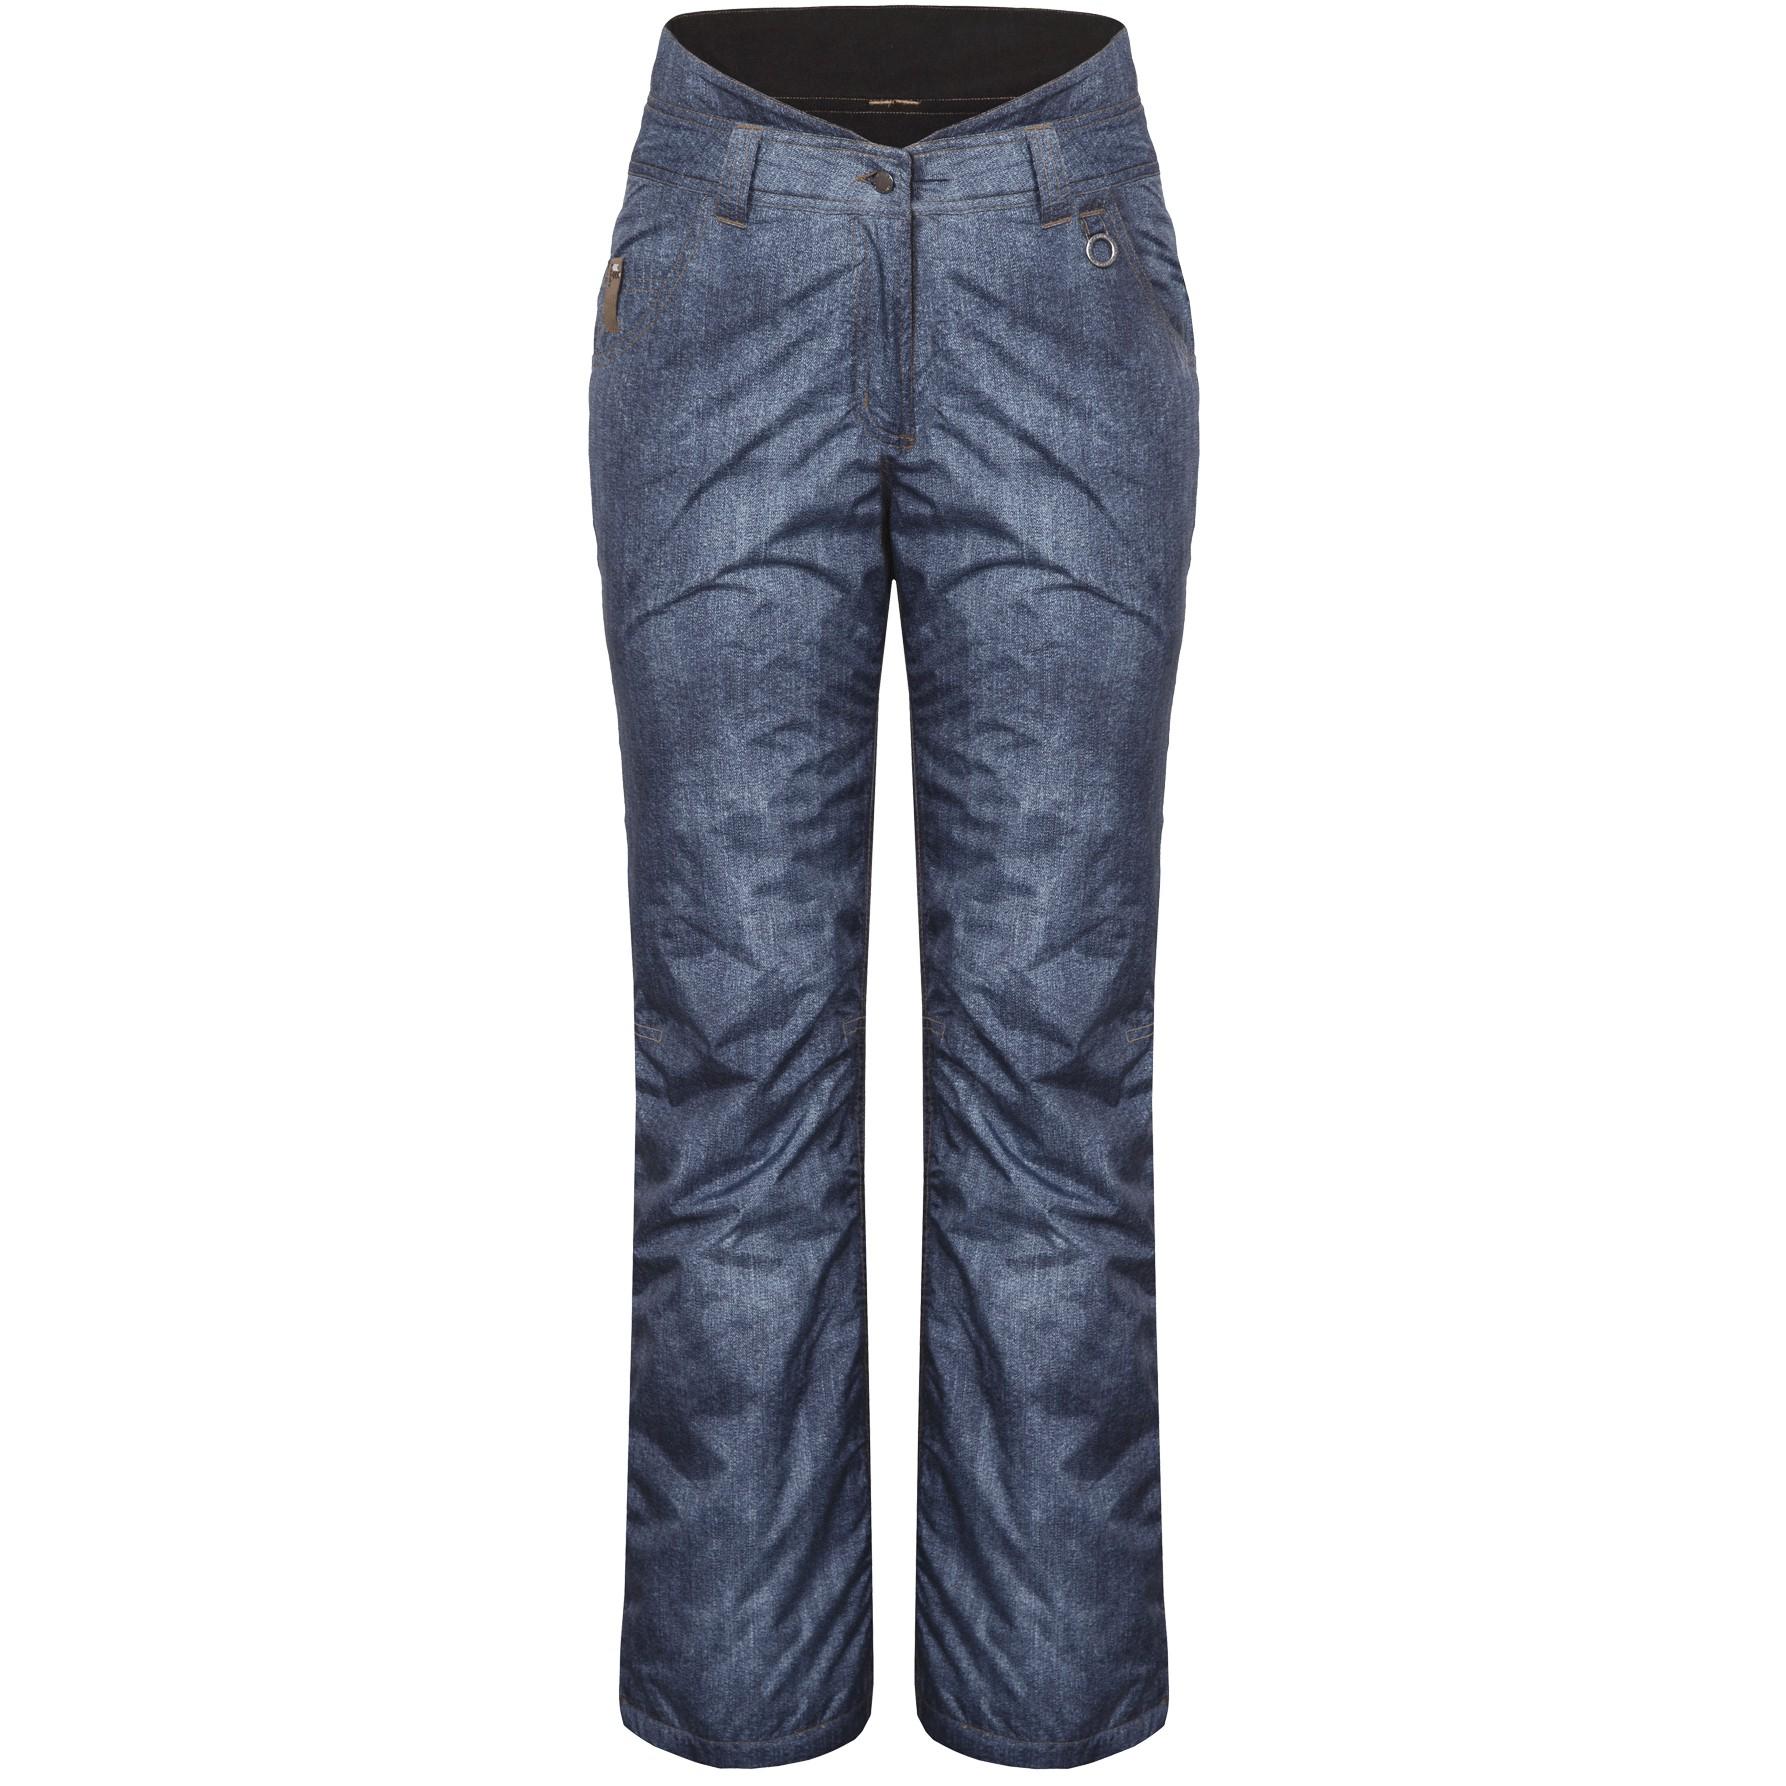 icepeak jody skihose hose damen ski jeansoptik blau ebay. Black Bedroom Furniture Sets. Home Design Ideas